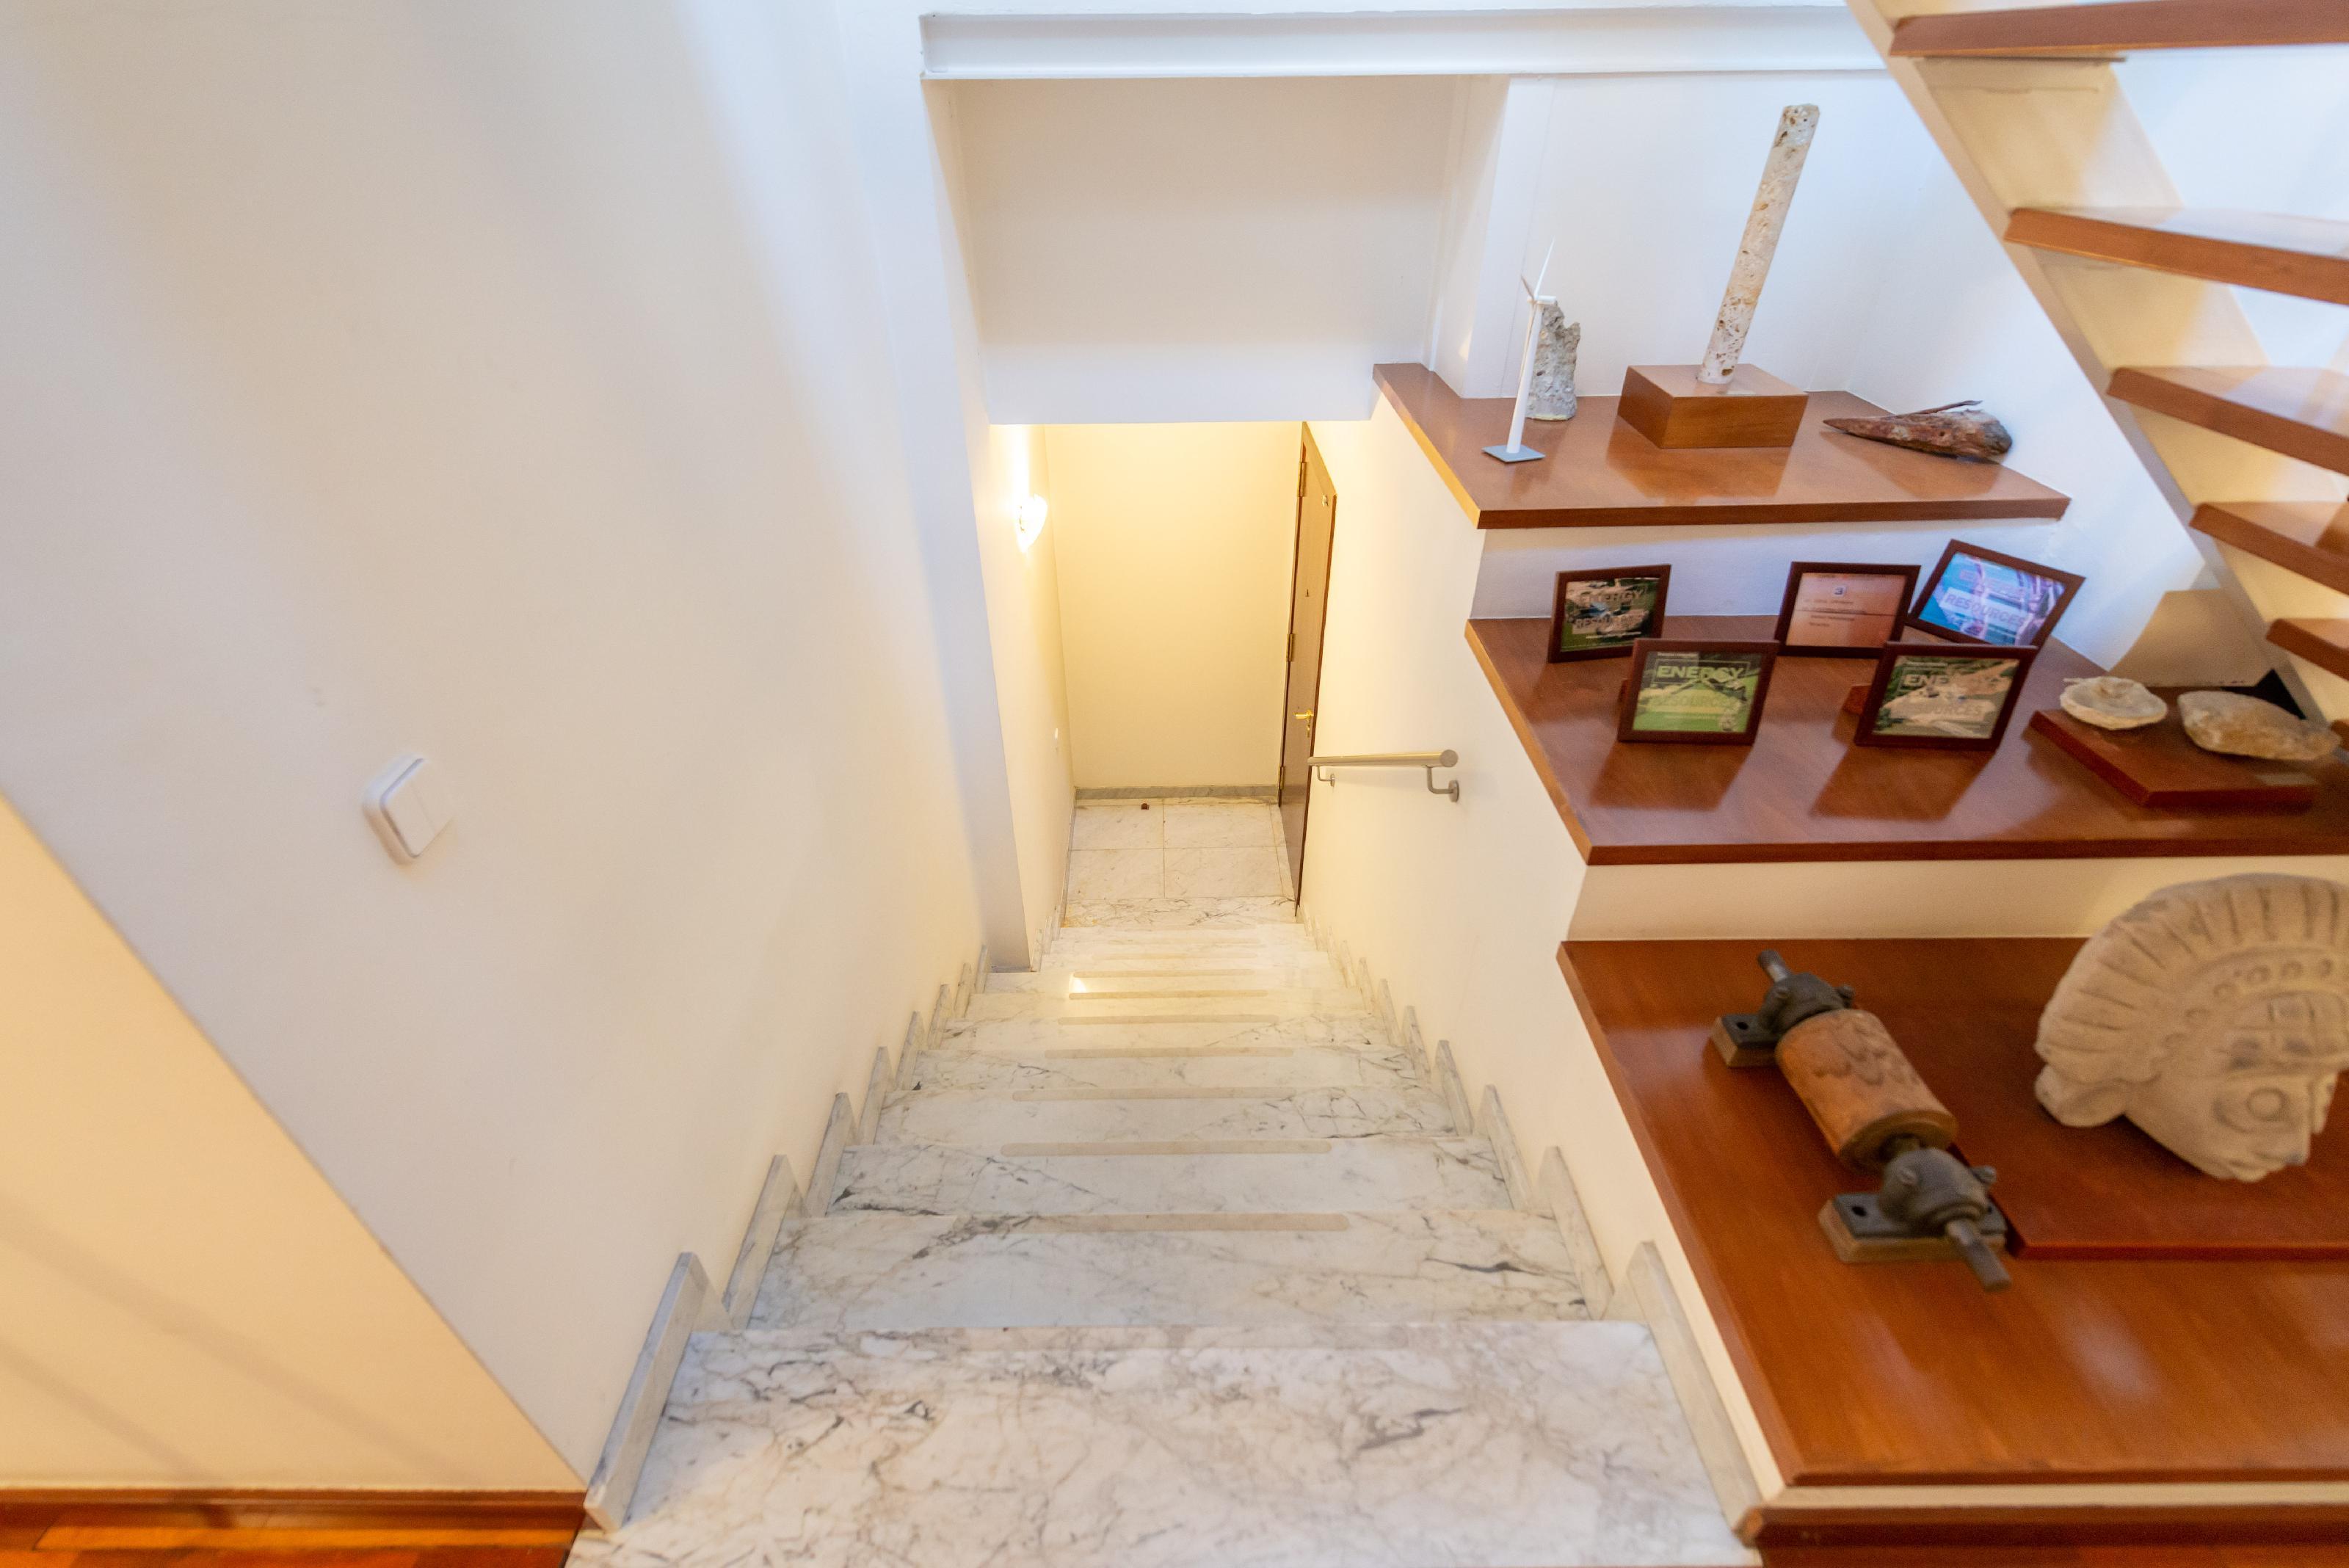 246066 Penthouse for sale in Sarrià-Sant Gervasi, Sarrià 4